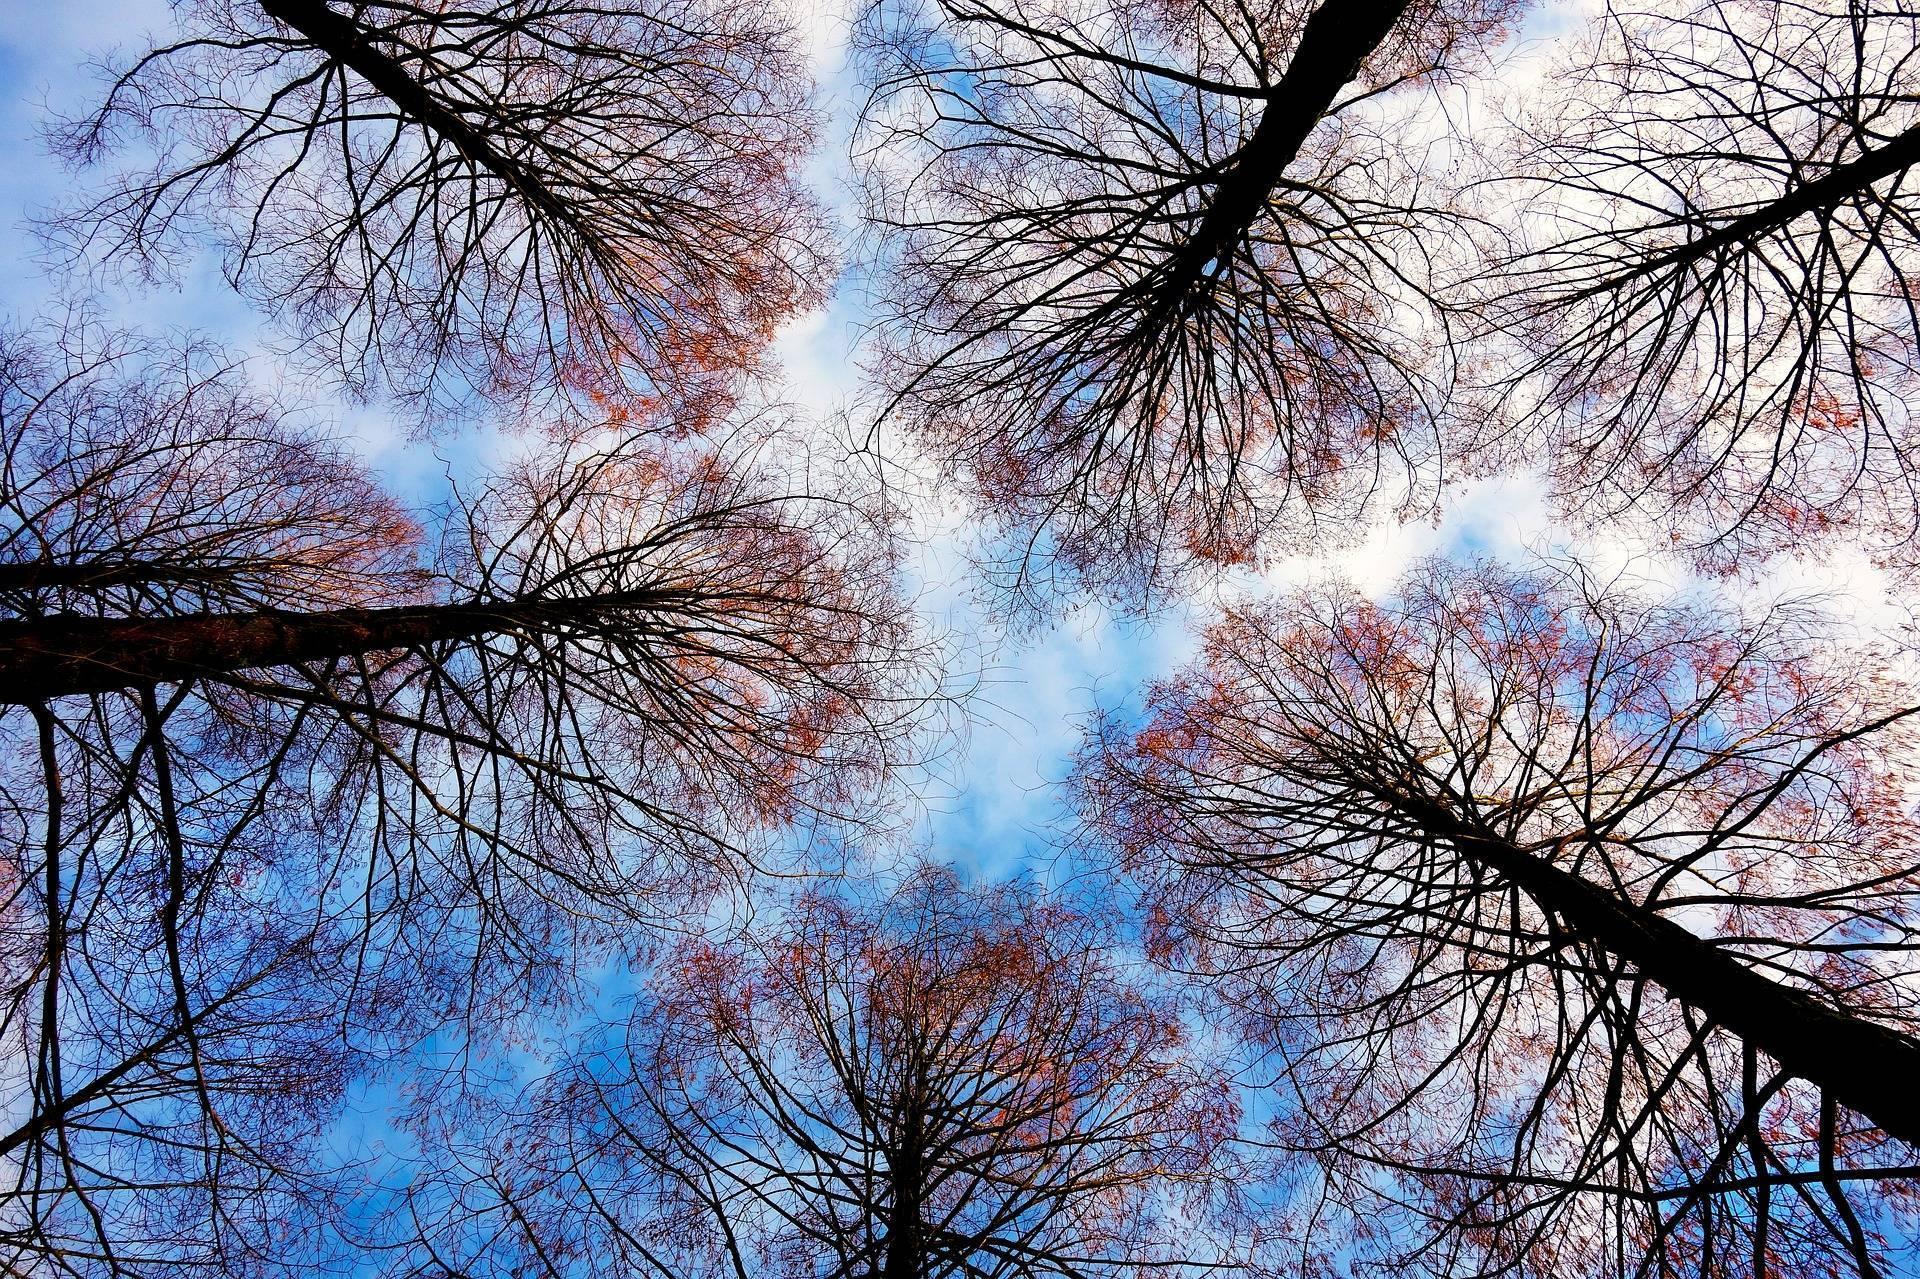 tree-tops-2991743_1920.jpg